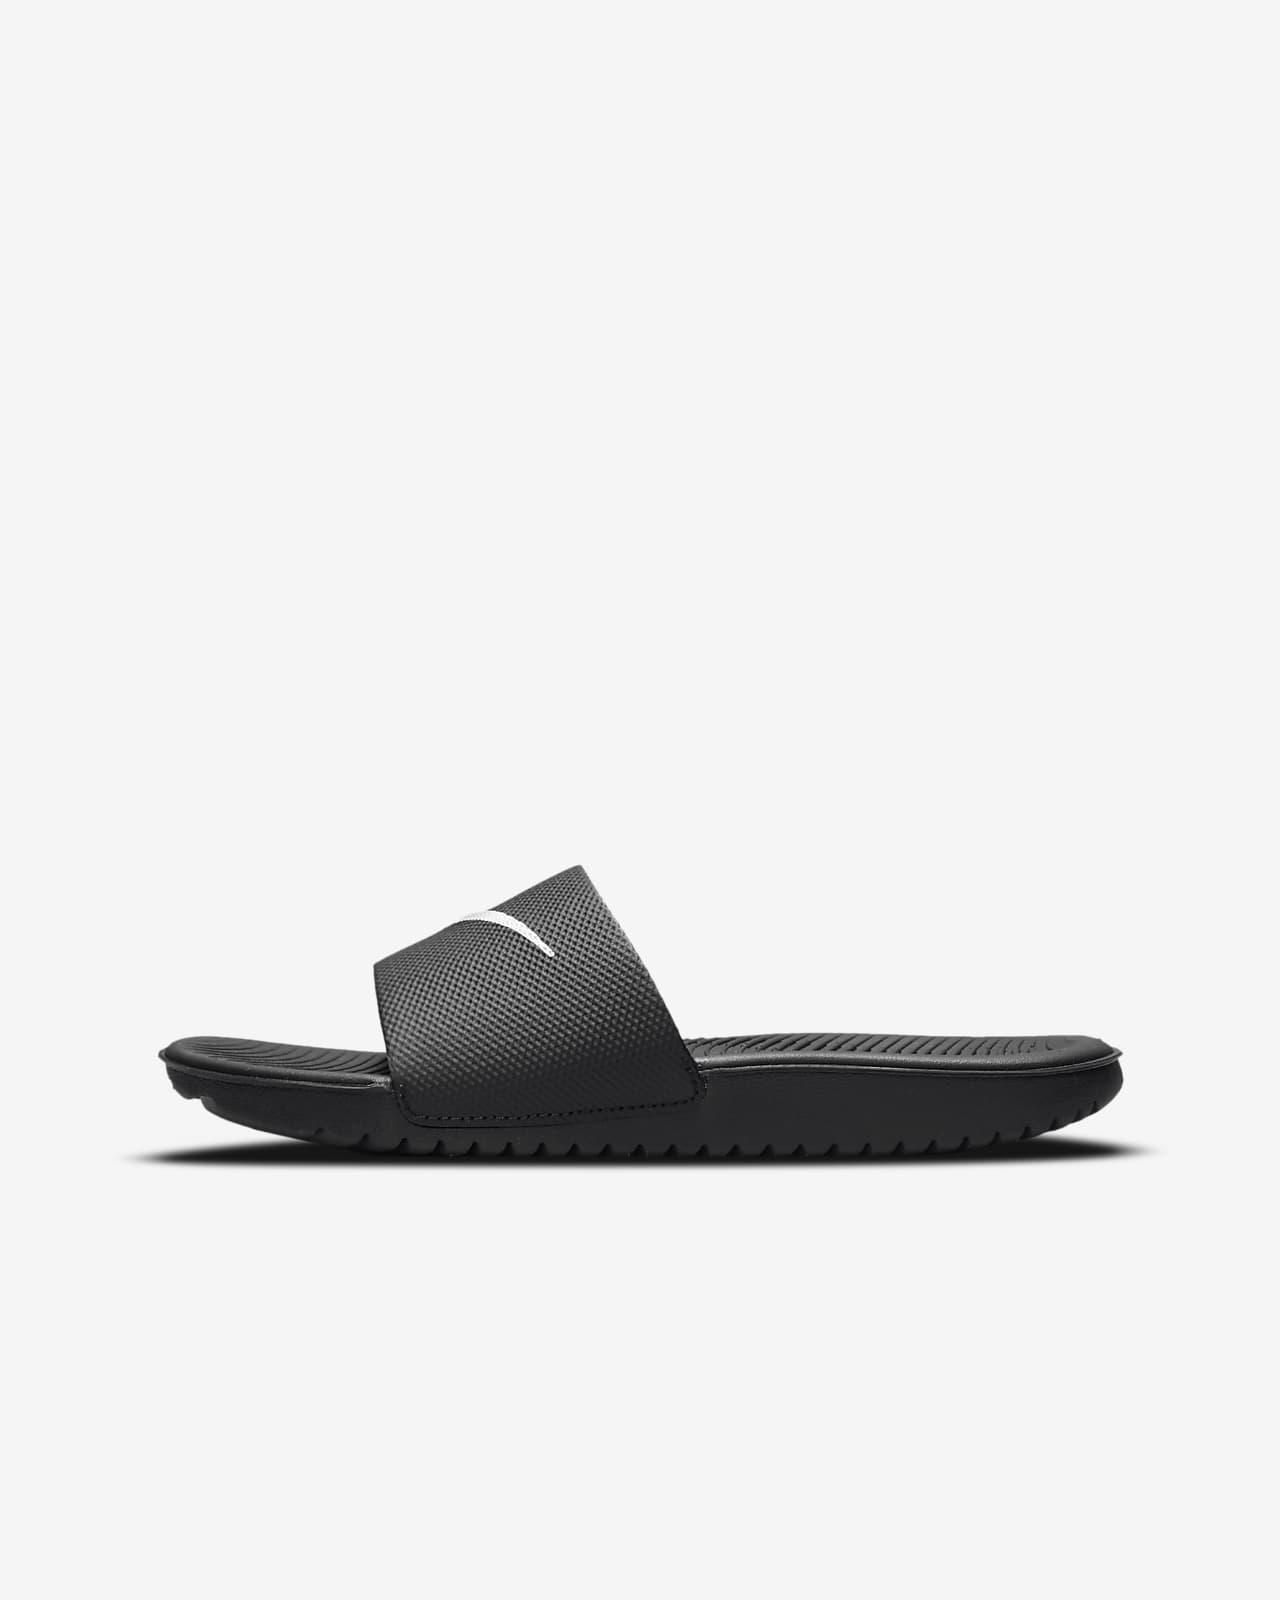 Nike Kawa Küçük/Genç Çocuk Terliği